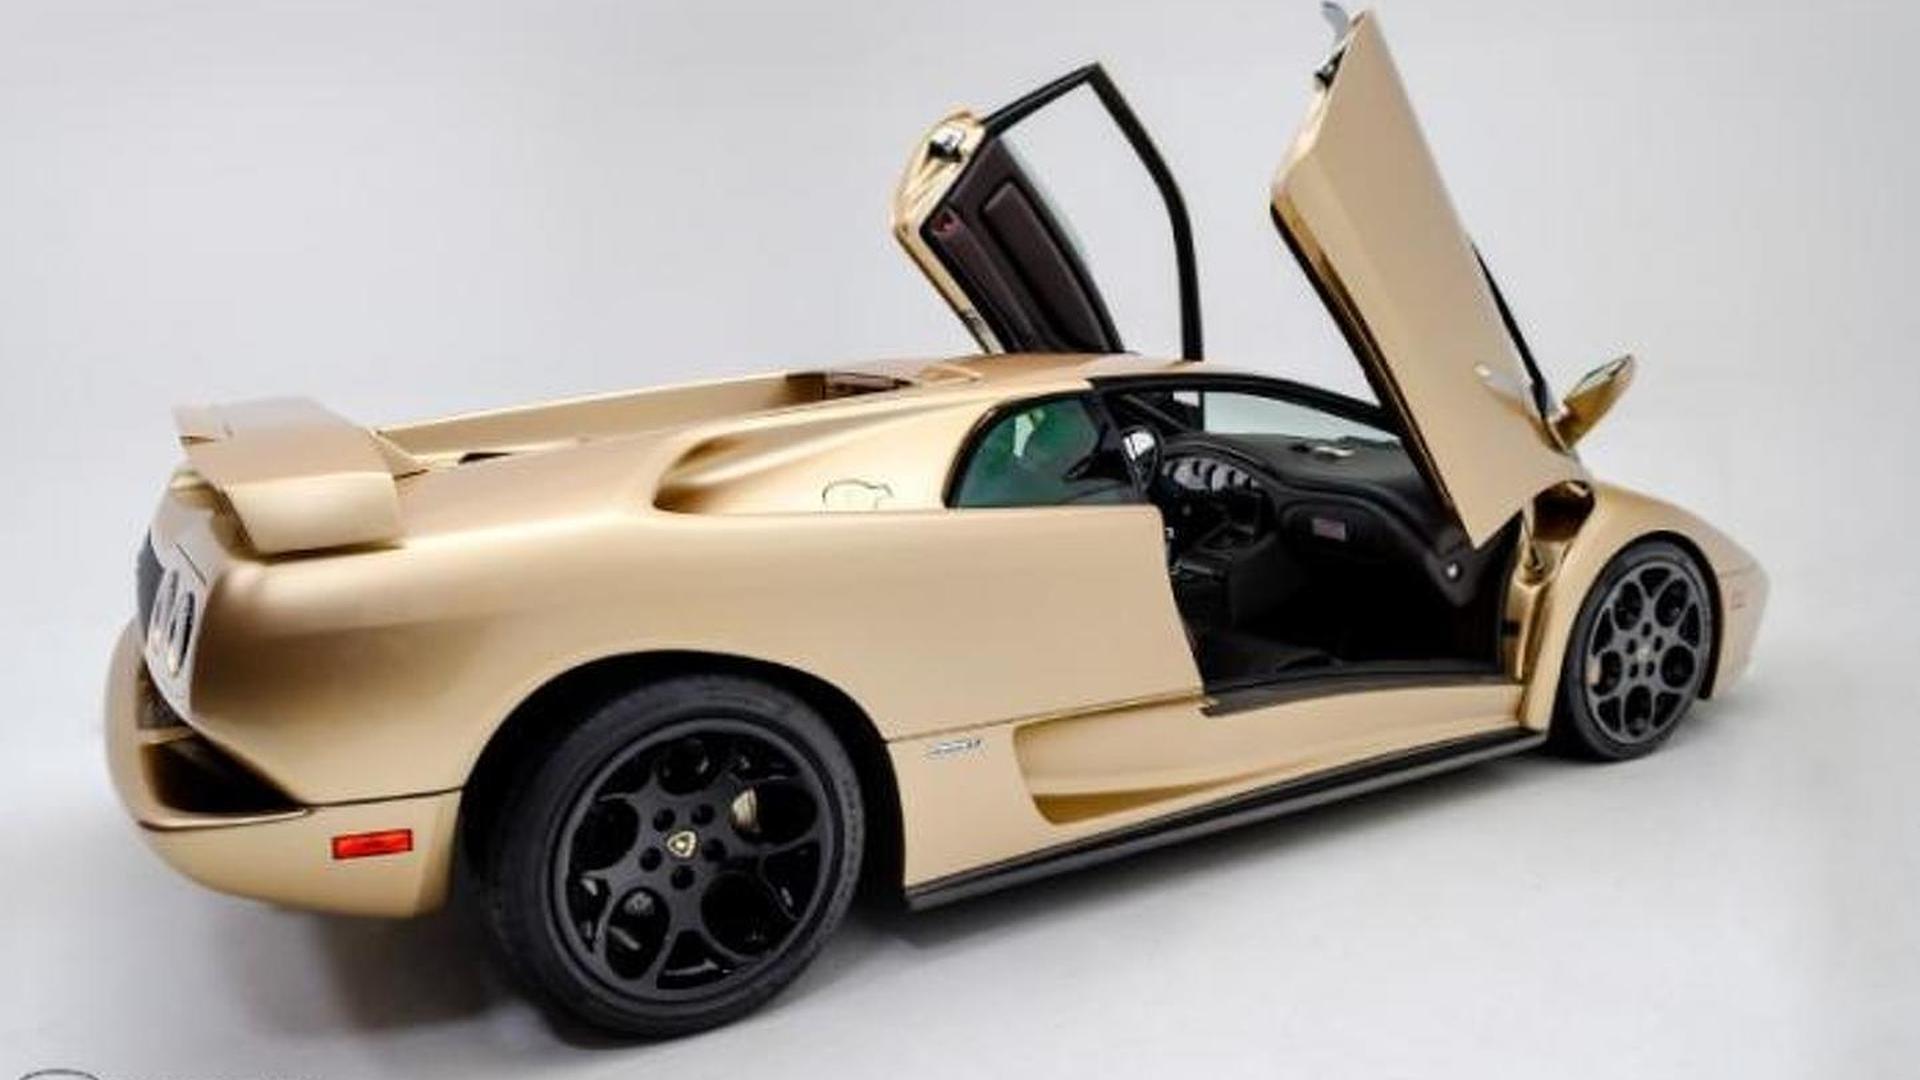 Lamborghini Diablo Oro Elios